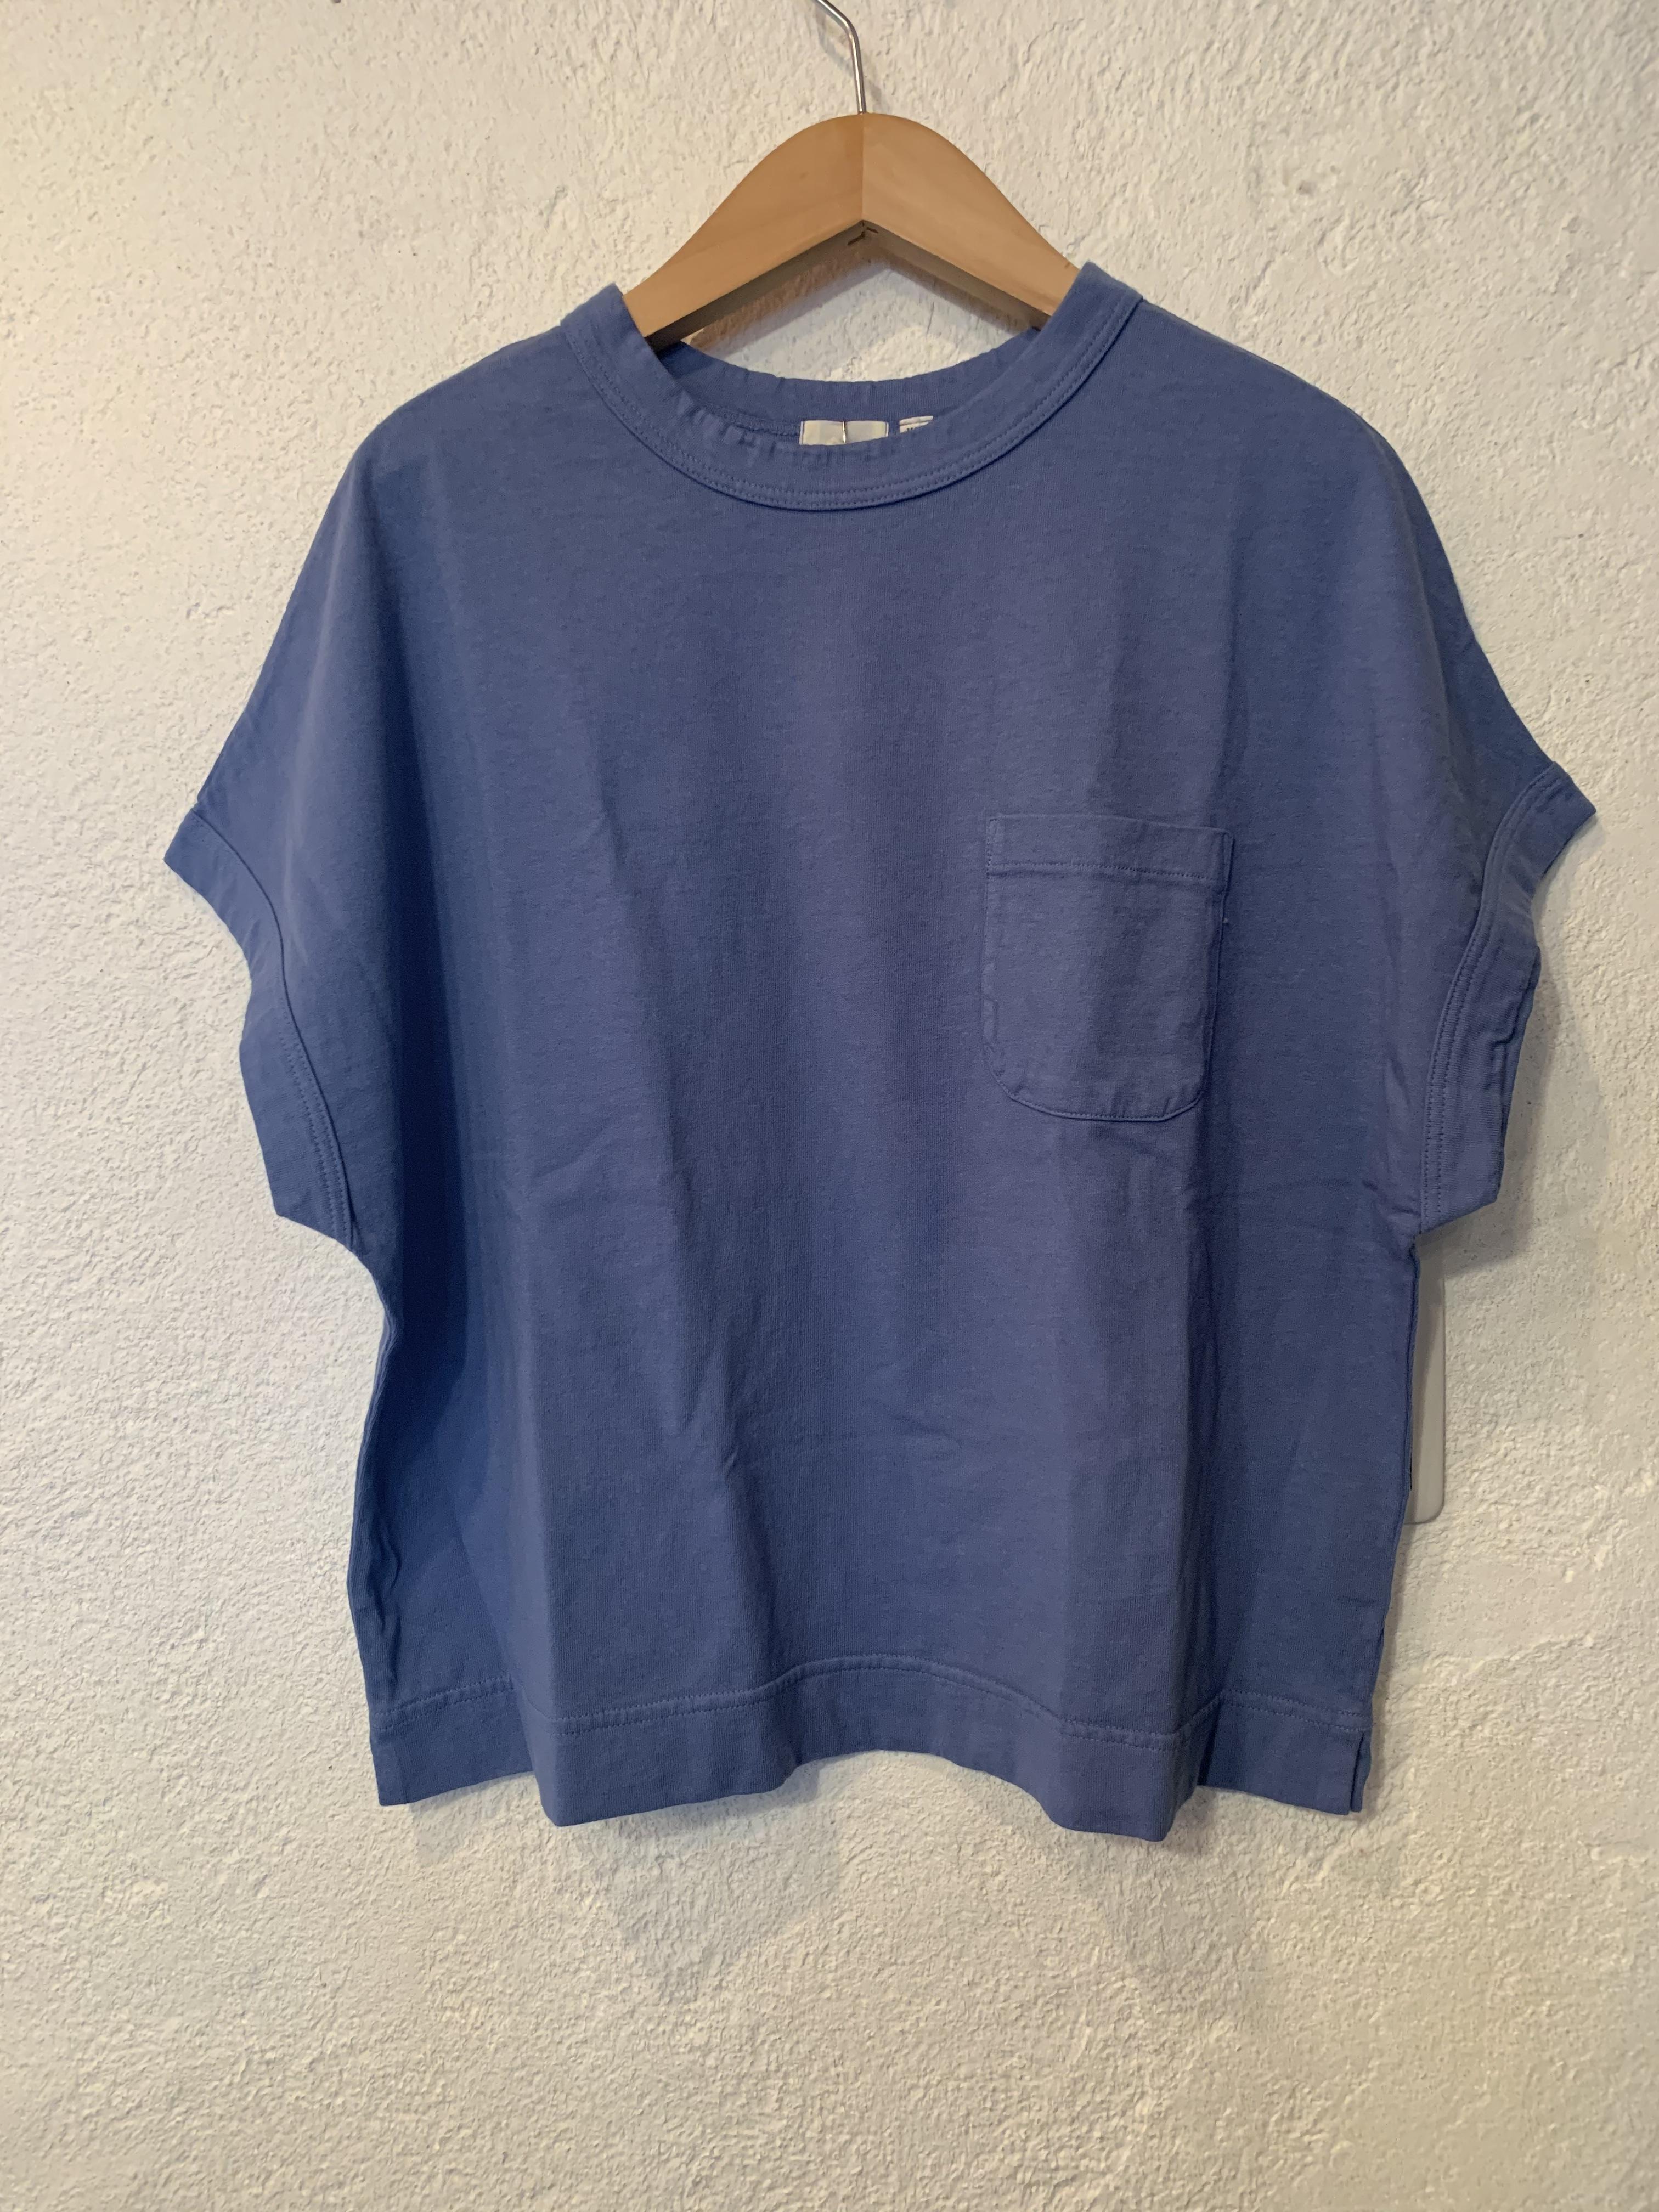 days/アメリカンドライ天竺ポケット付きTシャツ  ブルー